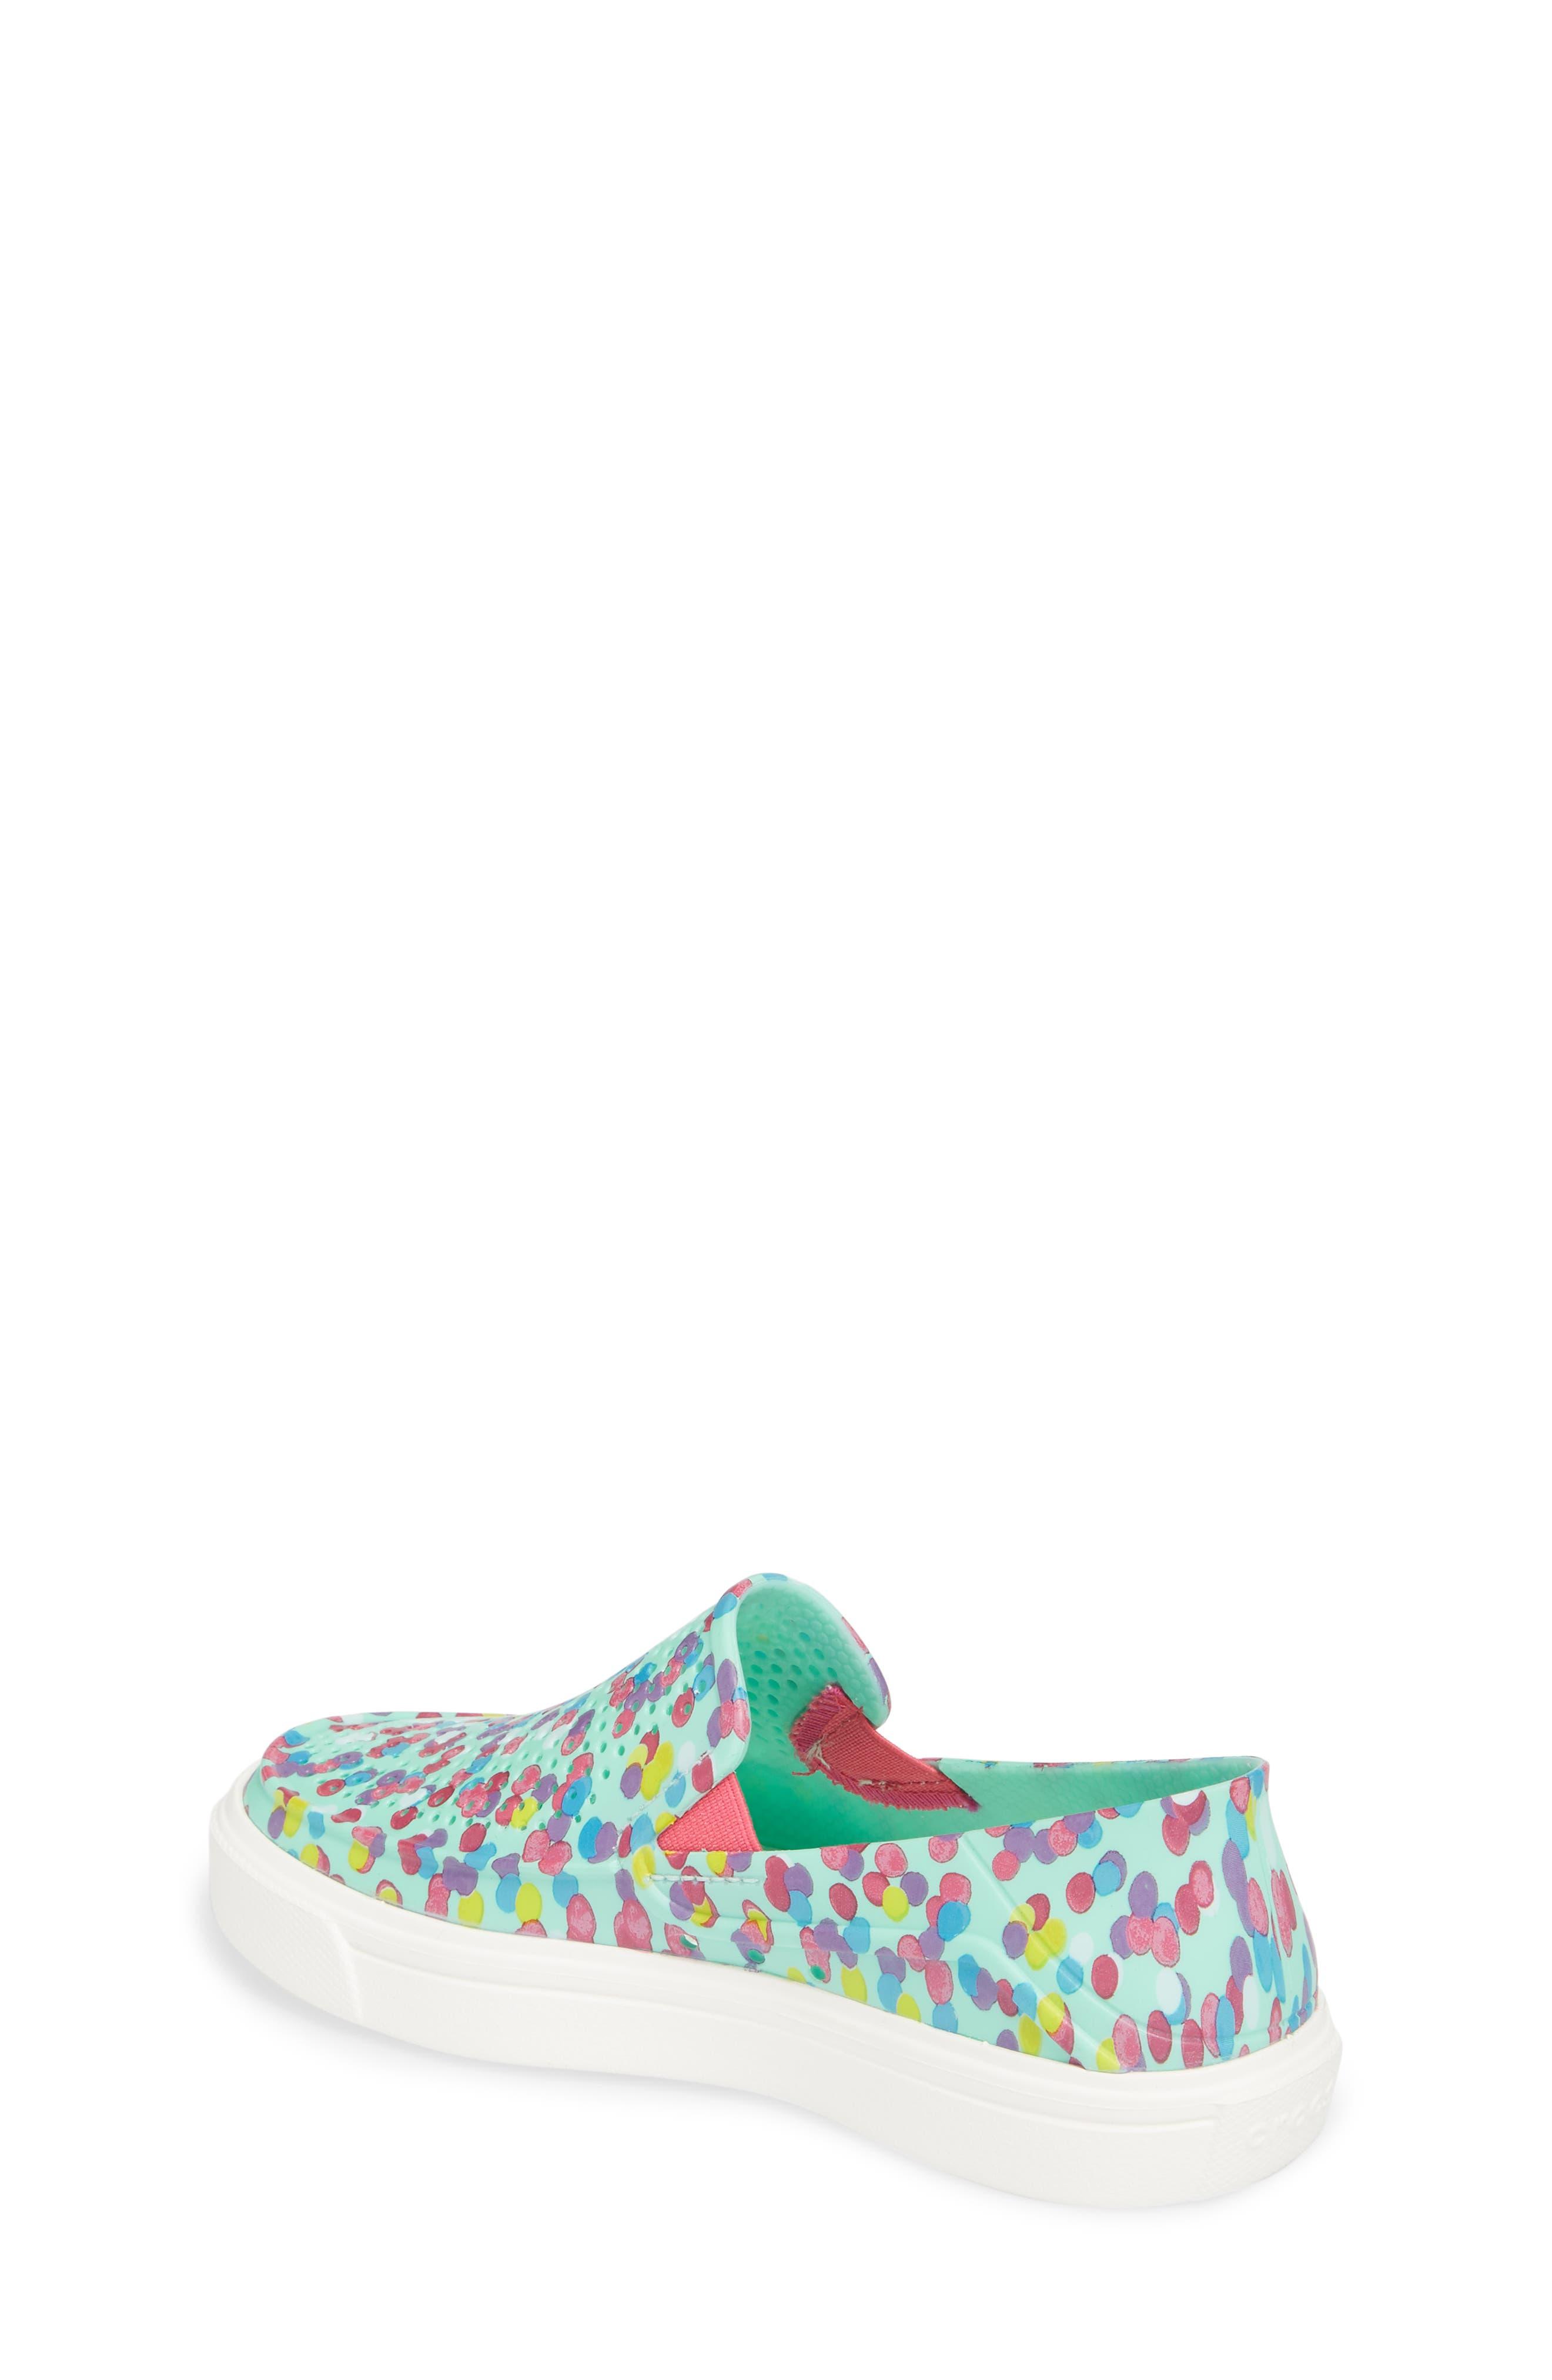 CitiLane Roka Graphic Slip-On Sneaker,                             Alternate thumbnail 2, color,                             Multi/ Mint